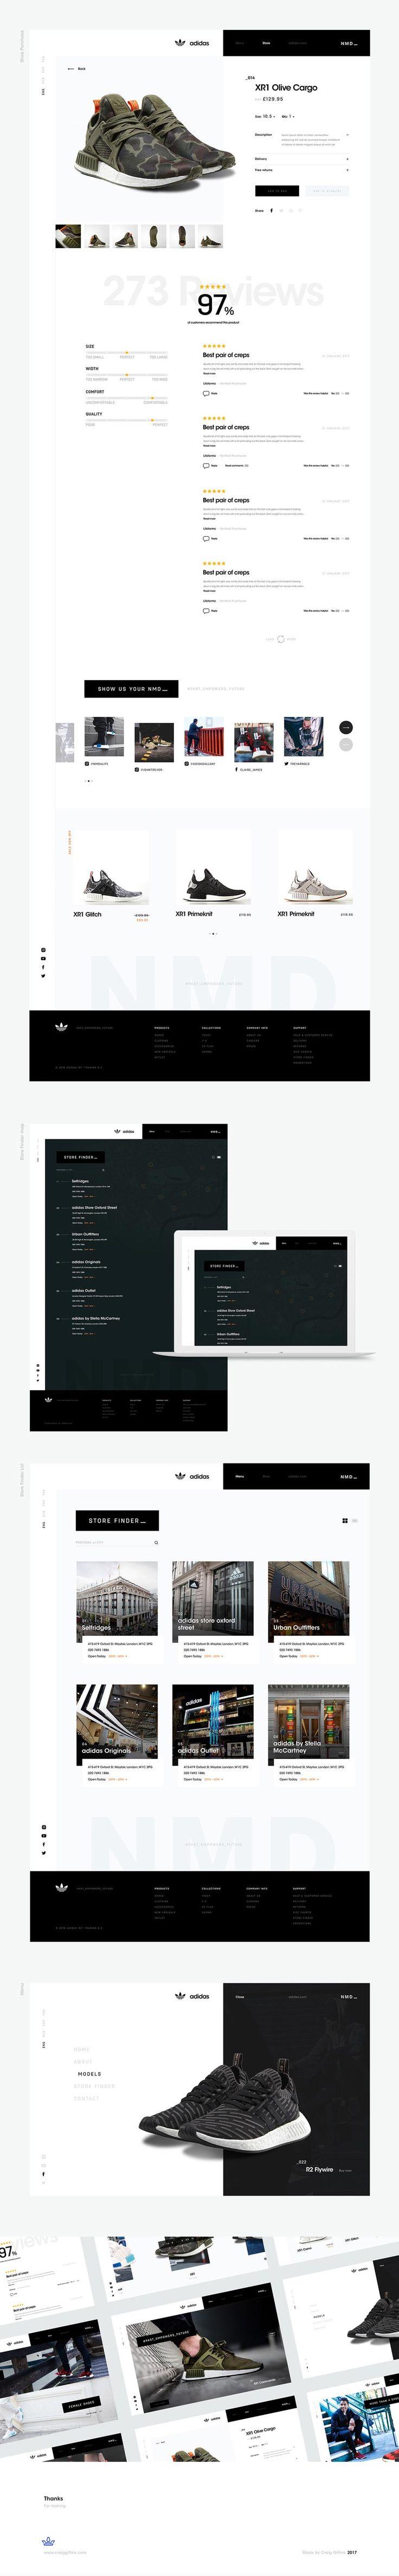 Adidas Website Concept - Behance #ui #ux#userexperience #website #webdesign #design